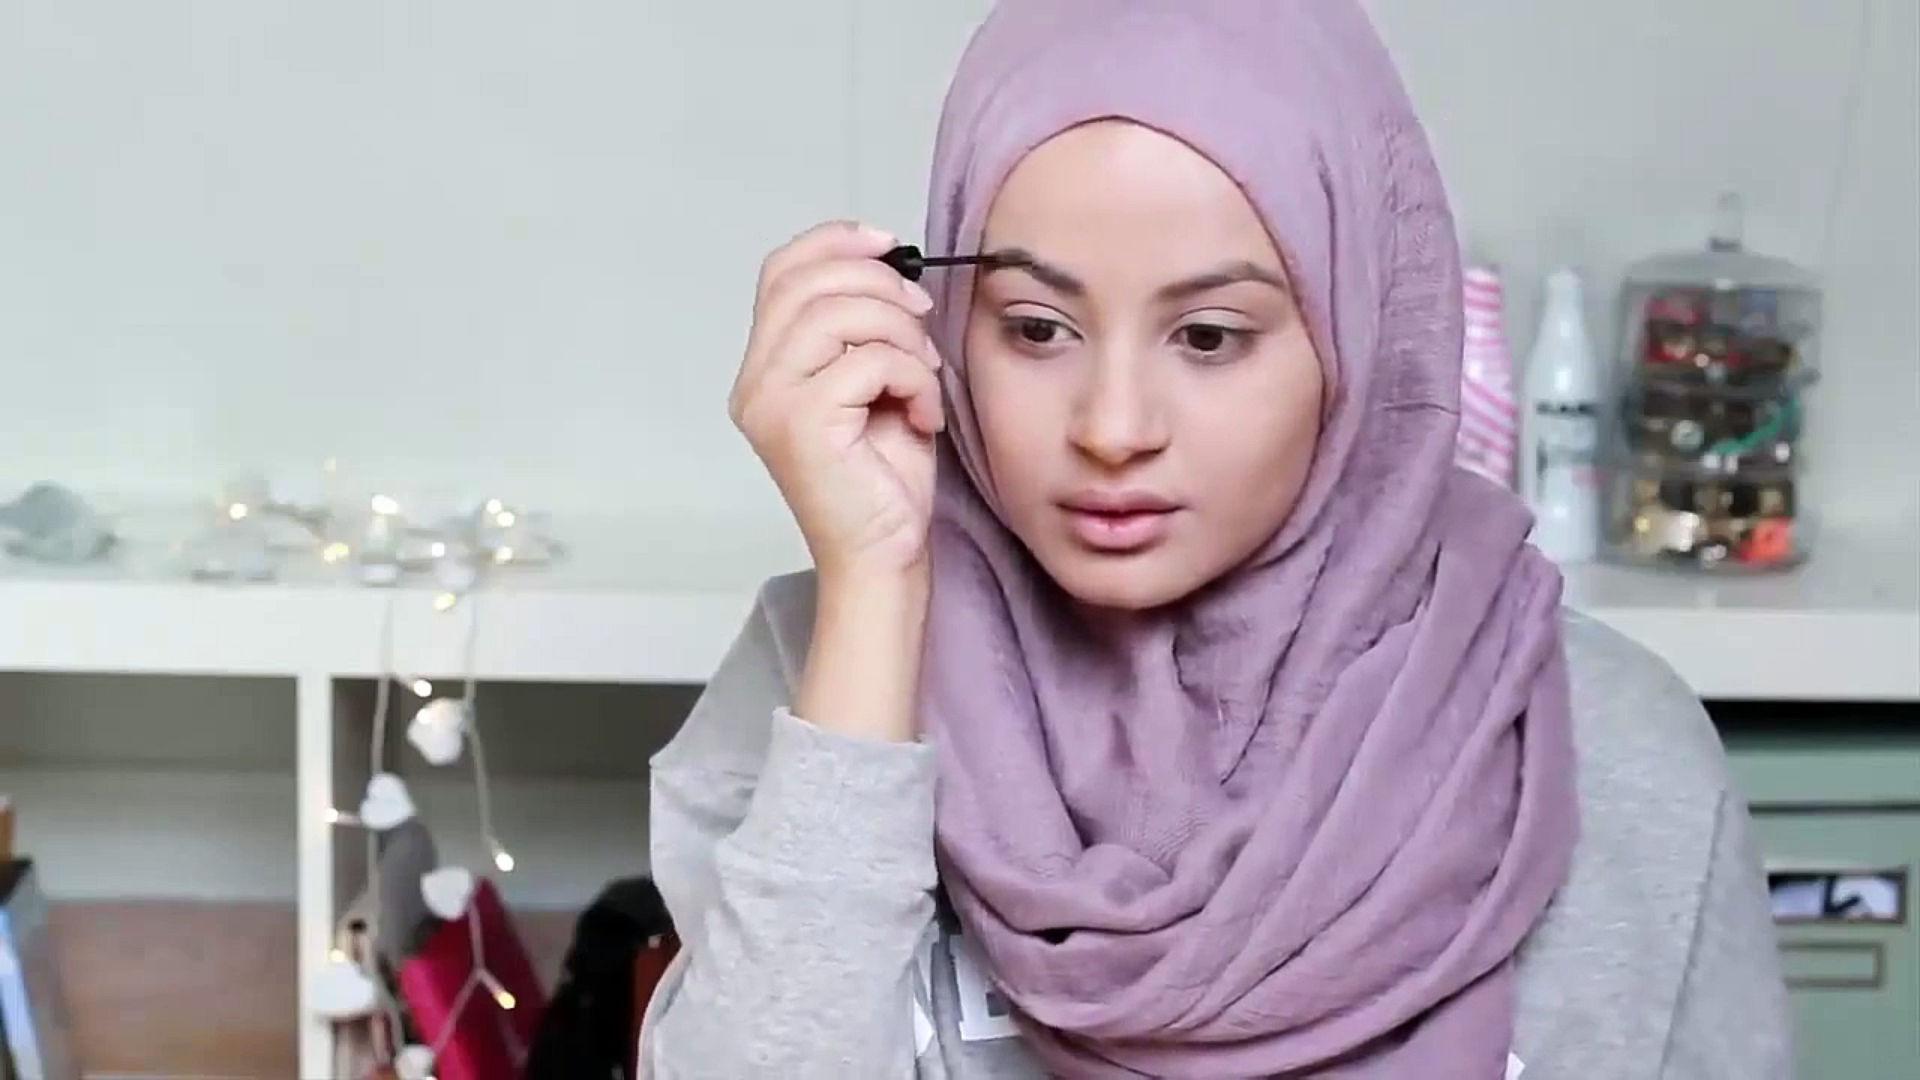 istri-hendak-berdandan-bagaimana-hukum-membeli-make-up-untuk-istri-QbIEyVogtL.jpg